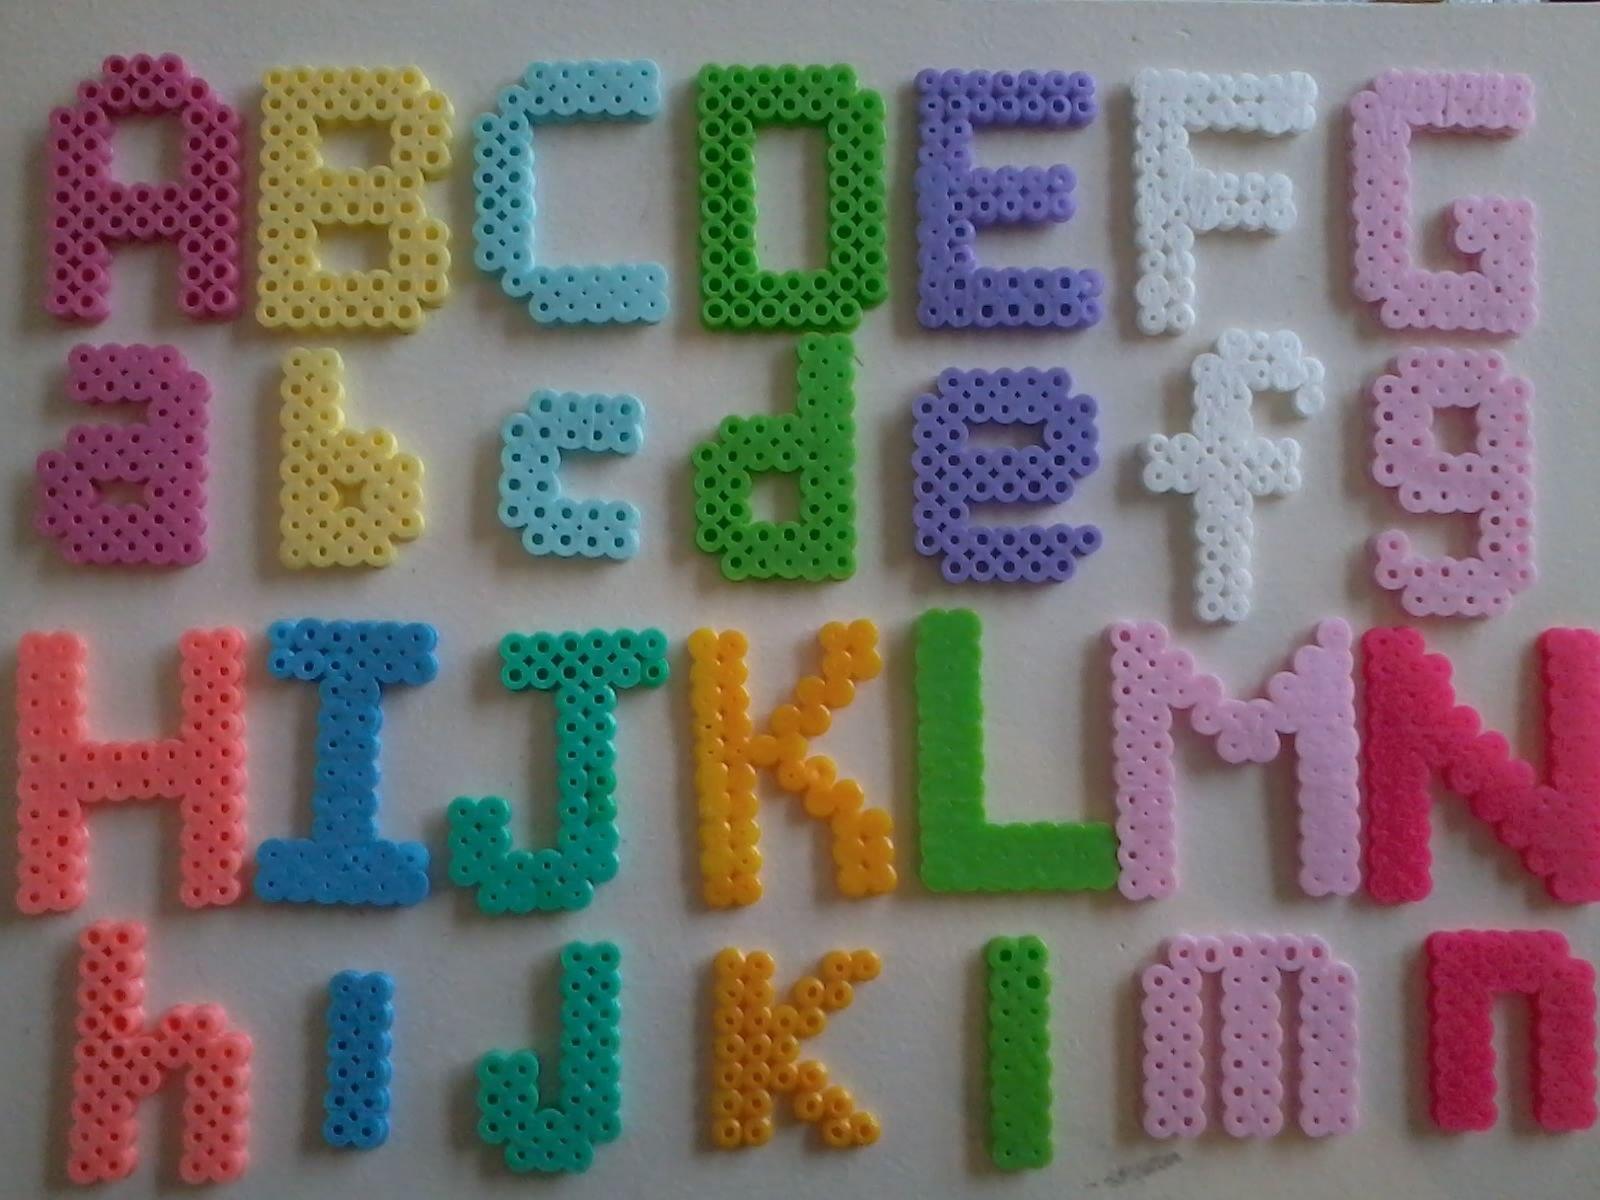 Alphabet Letra Alfabeto Letter Template Diseño Molde With Regard To Hama Bead Letter Templates